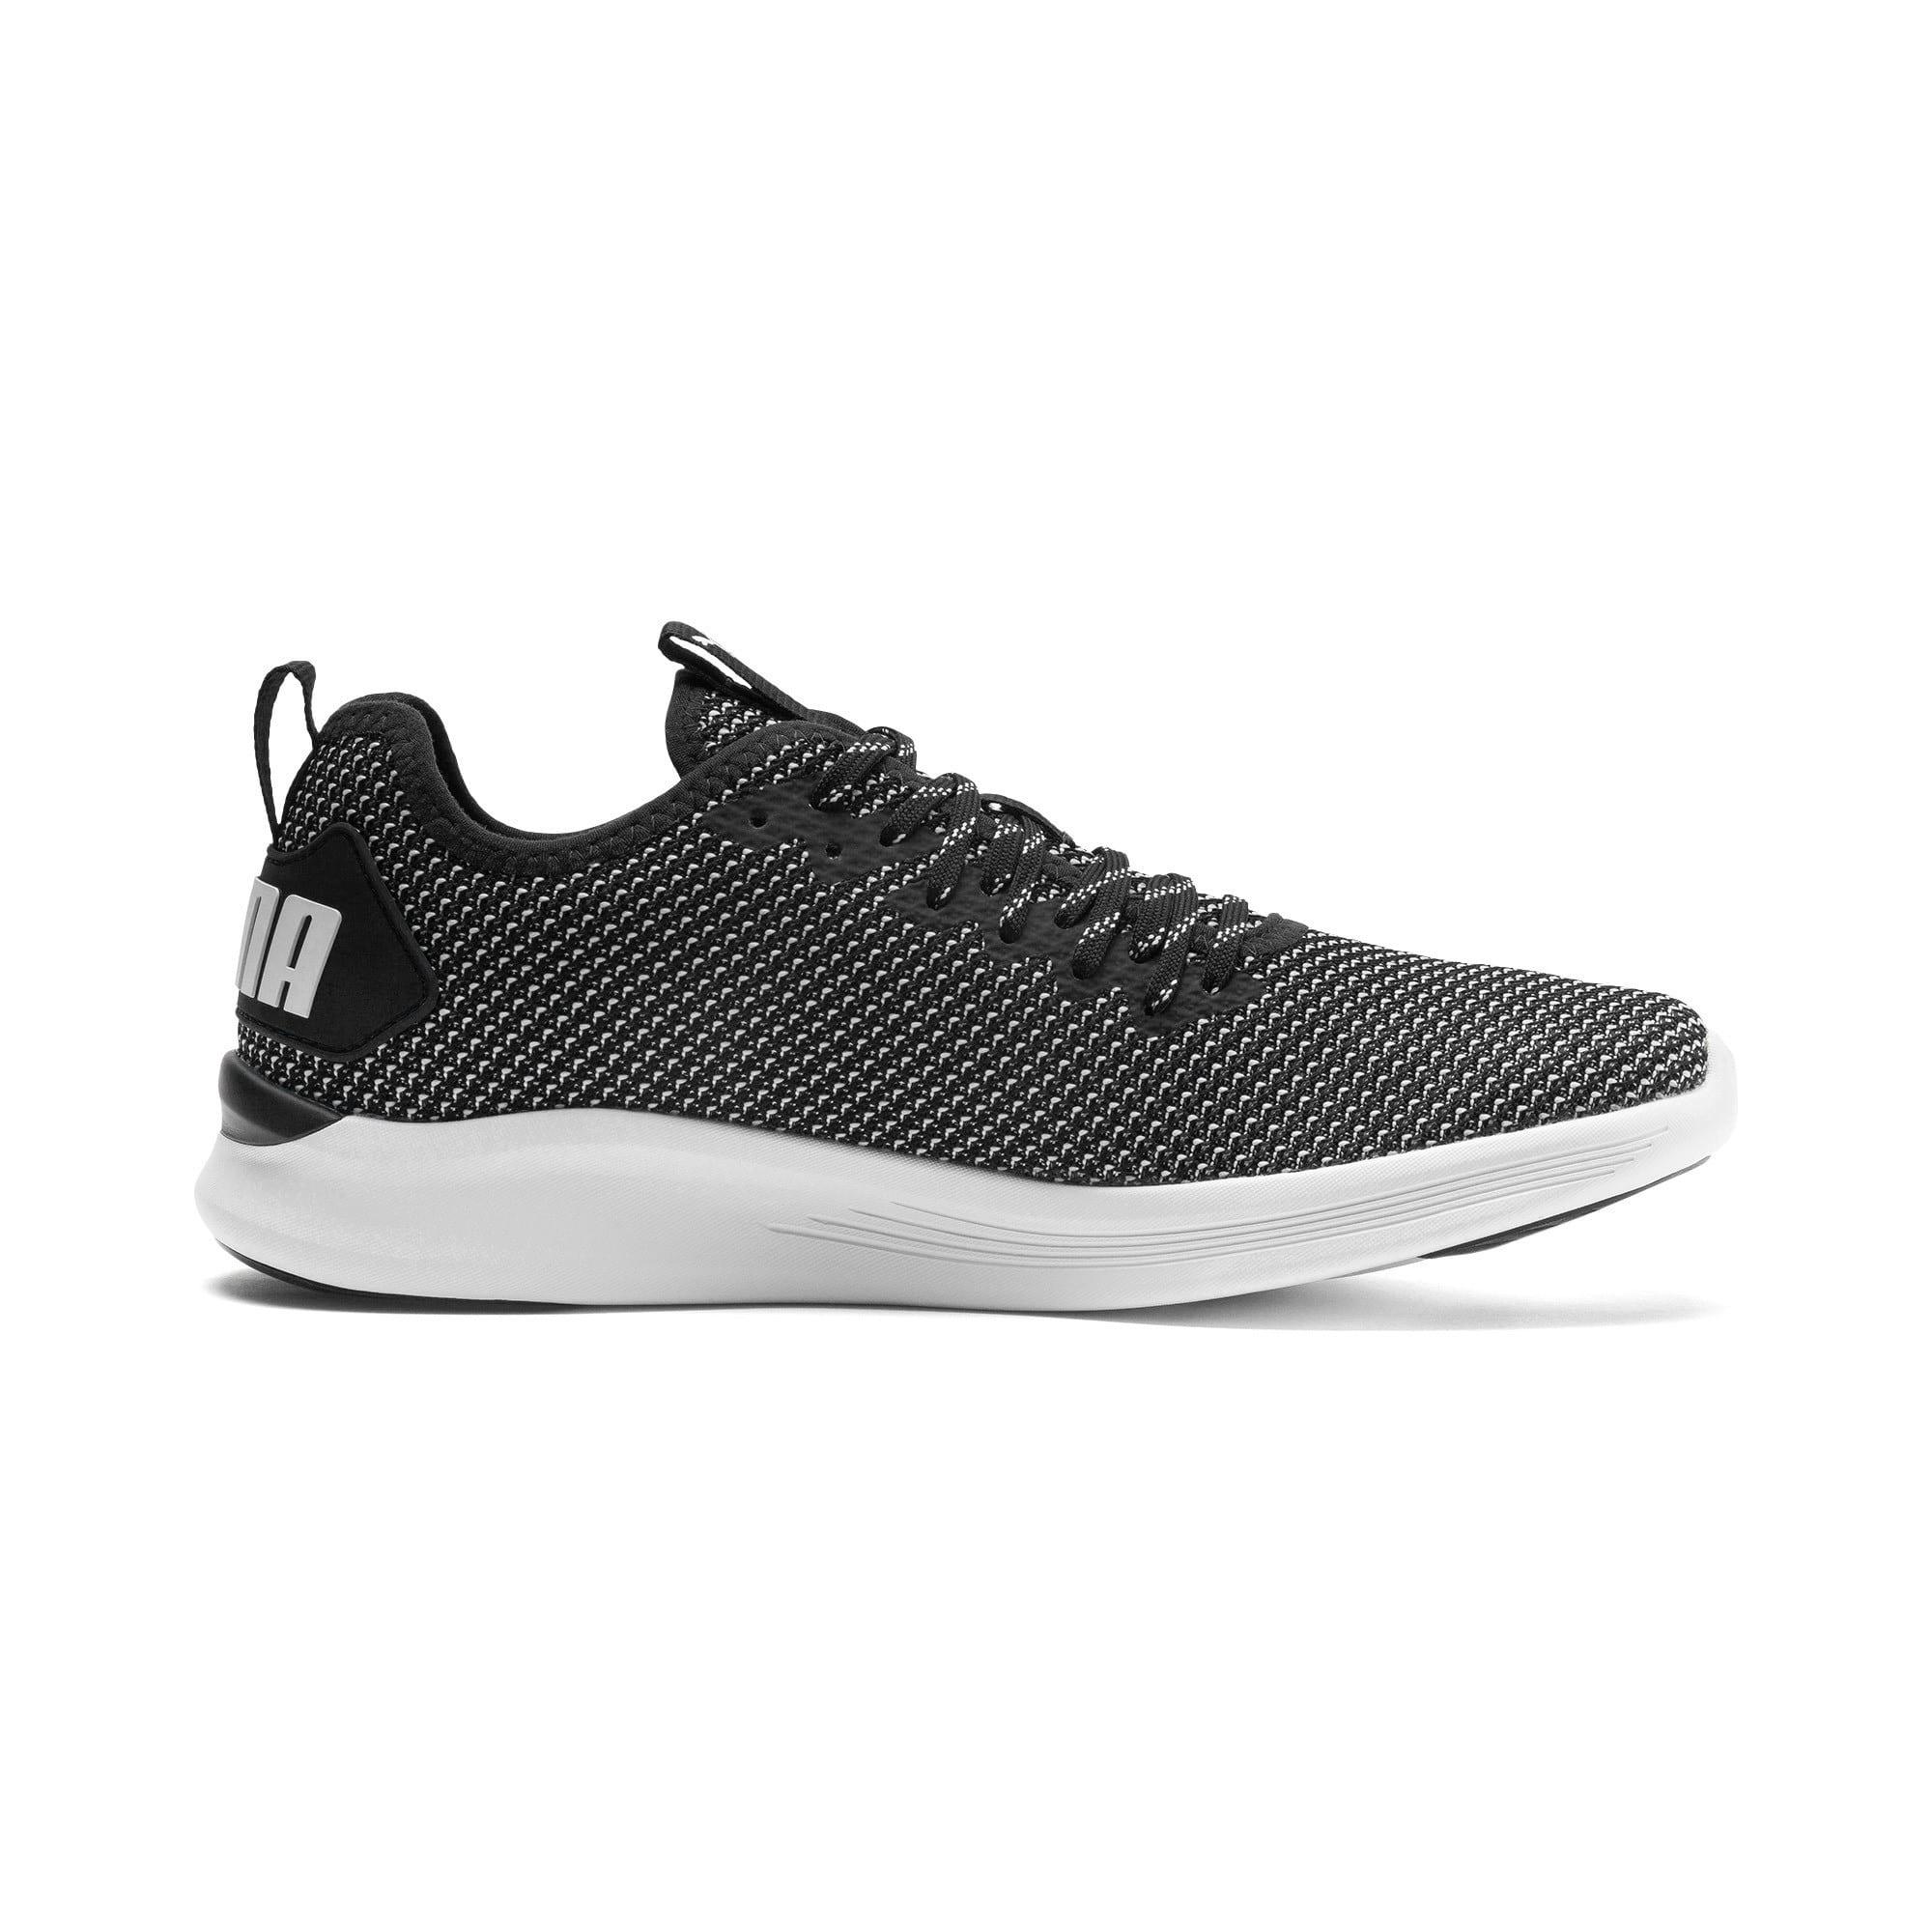 Thumbnail 5 of IGNITE Flash FS Men's Running Shoes, Puma Black-Puma White, medium